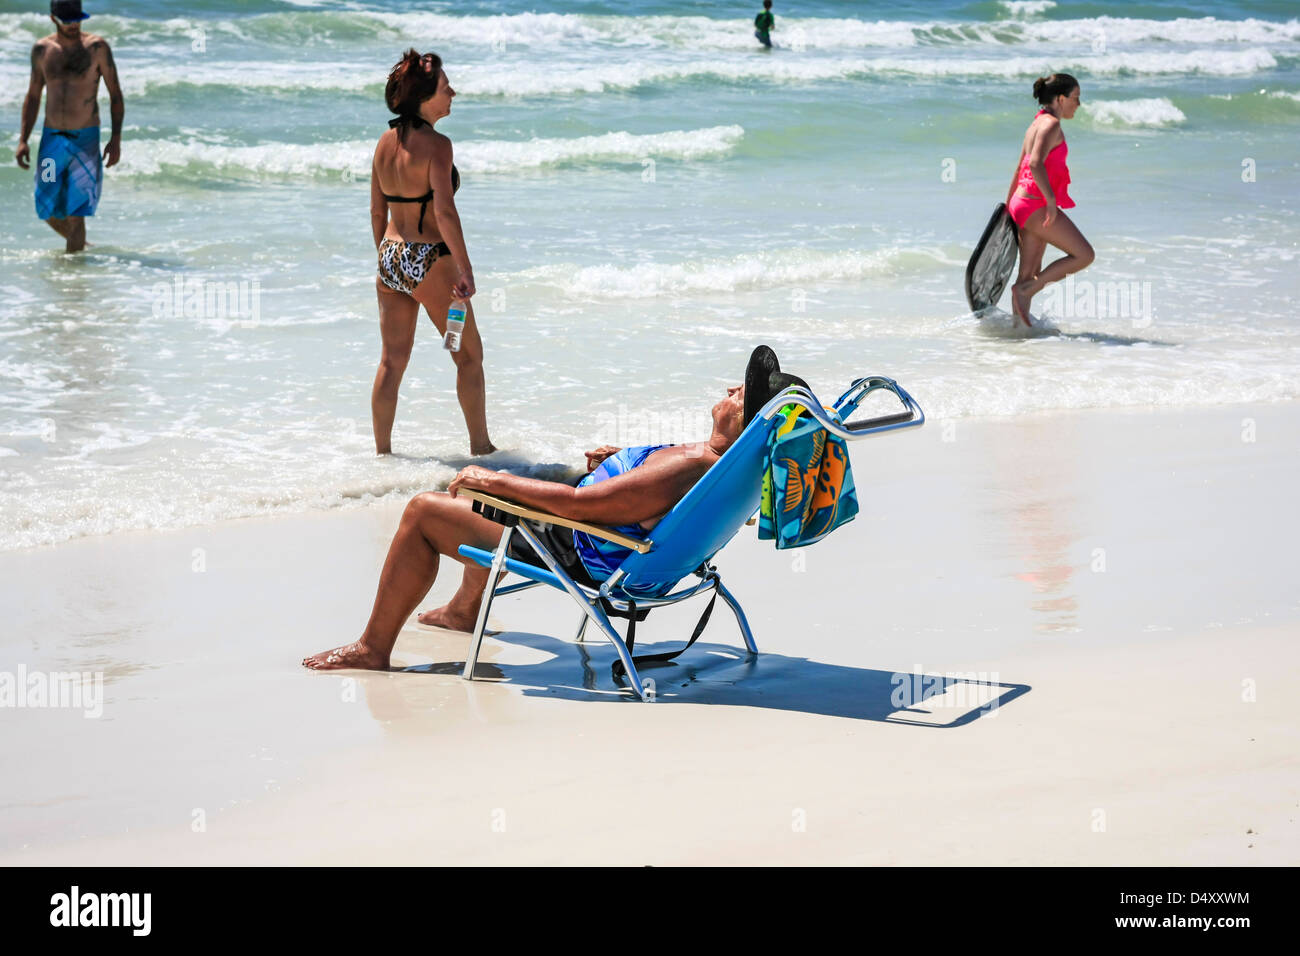 Female retiree enjoying the sunshine on Siesta Key beach Florida during Spring Break - Stock Image